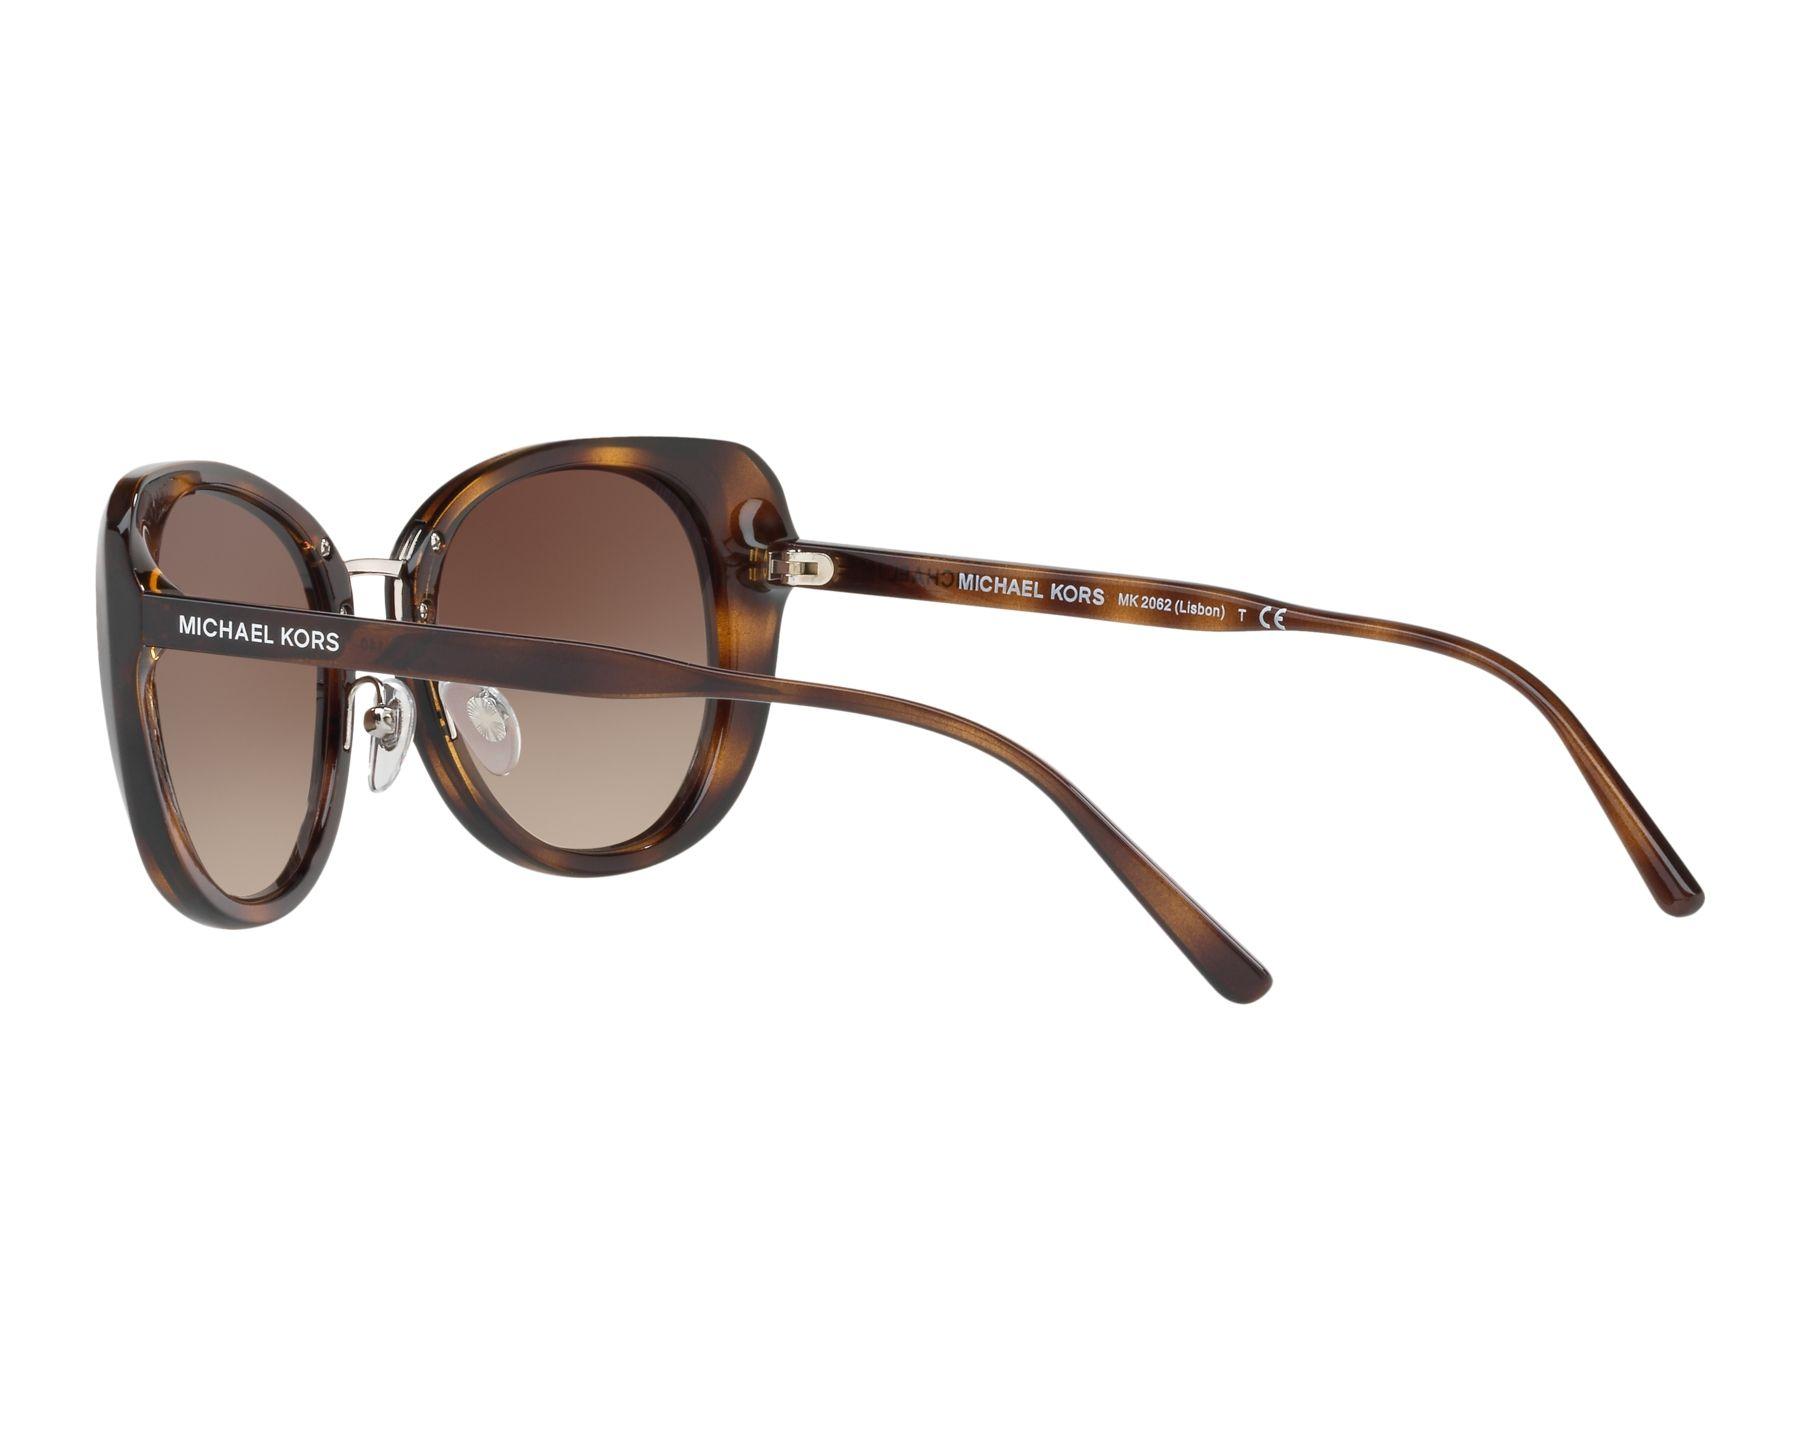 lunettes de soleil michael kors mk 2062 328513 havane pas cher visionet. Black Bedroom Furniture Sets. Home Design Ideas